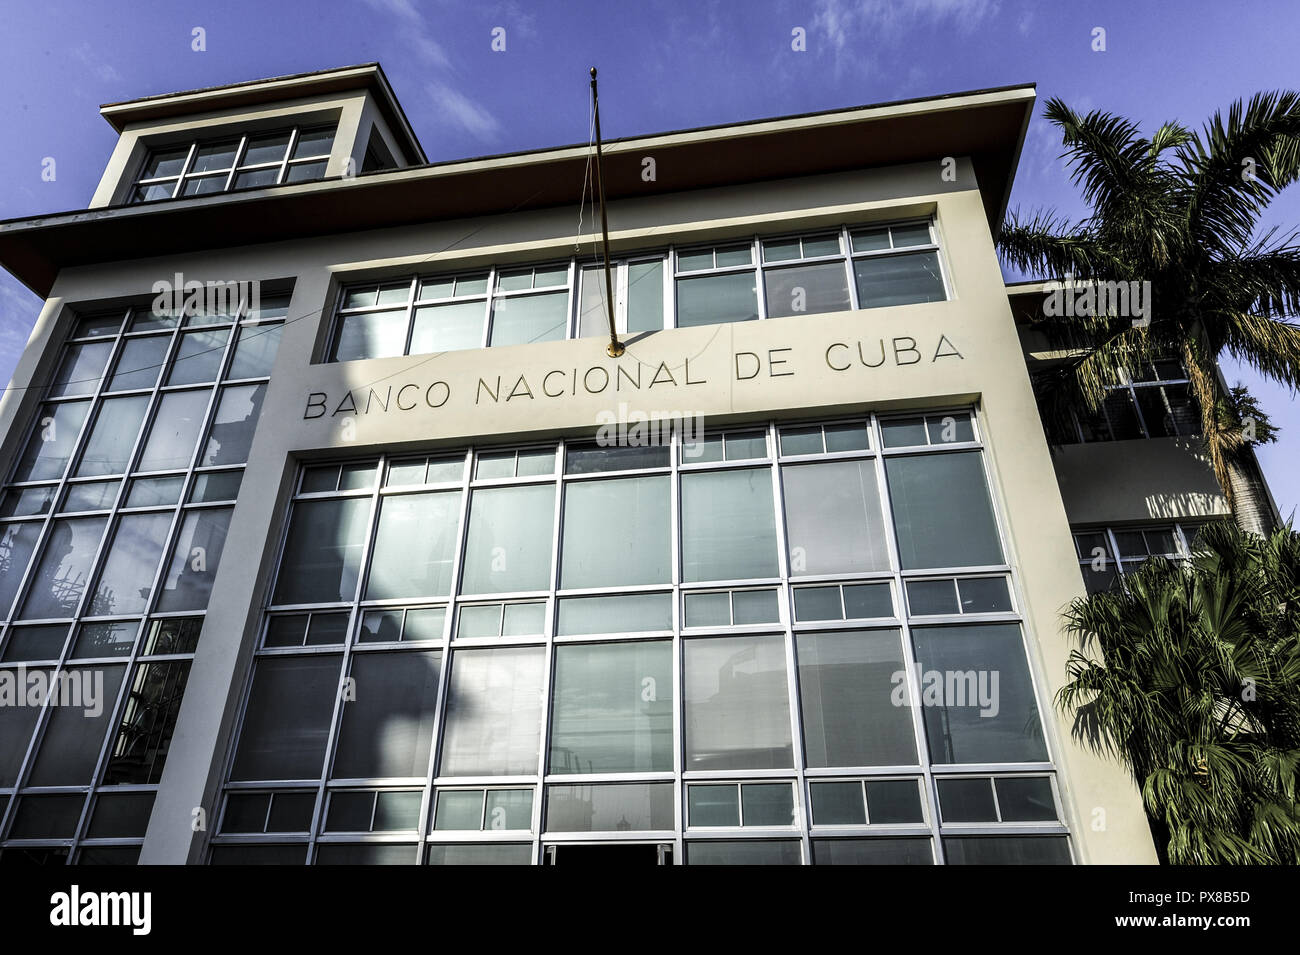 Cuba Santiago de Cuba, Parque Cespedes, Banco Nacional de Cuba, municipio Immagini Stock